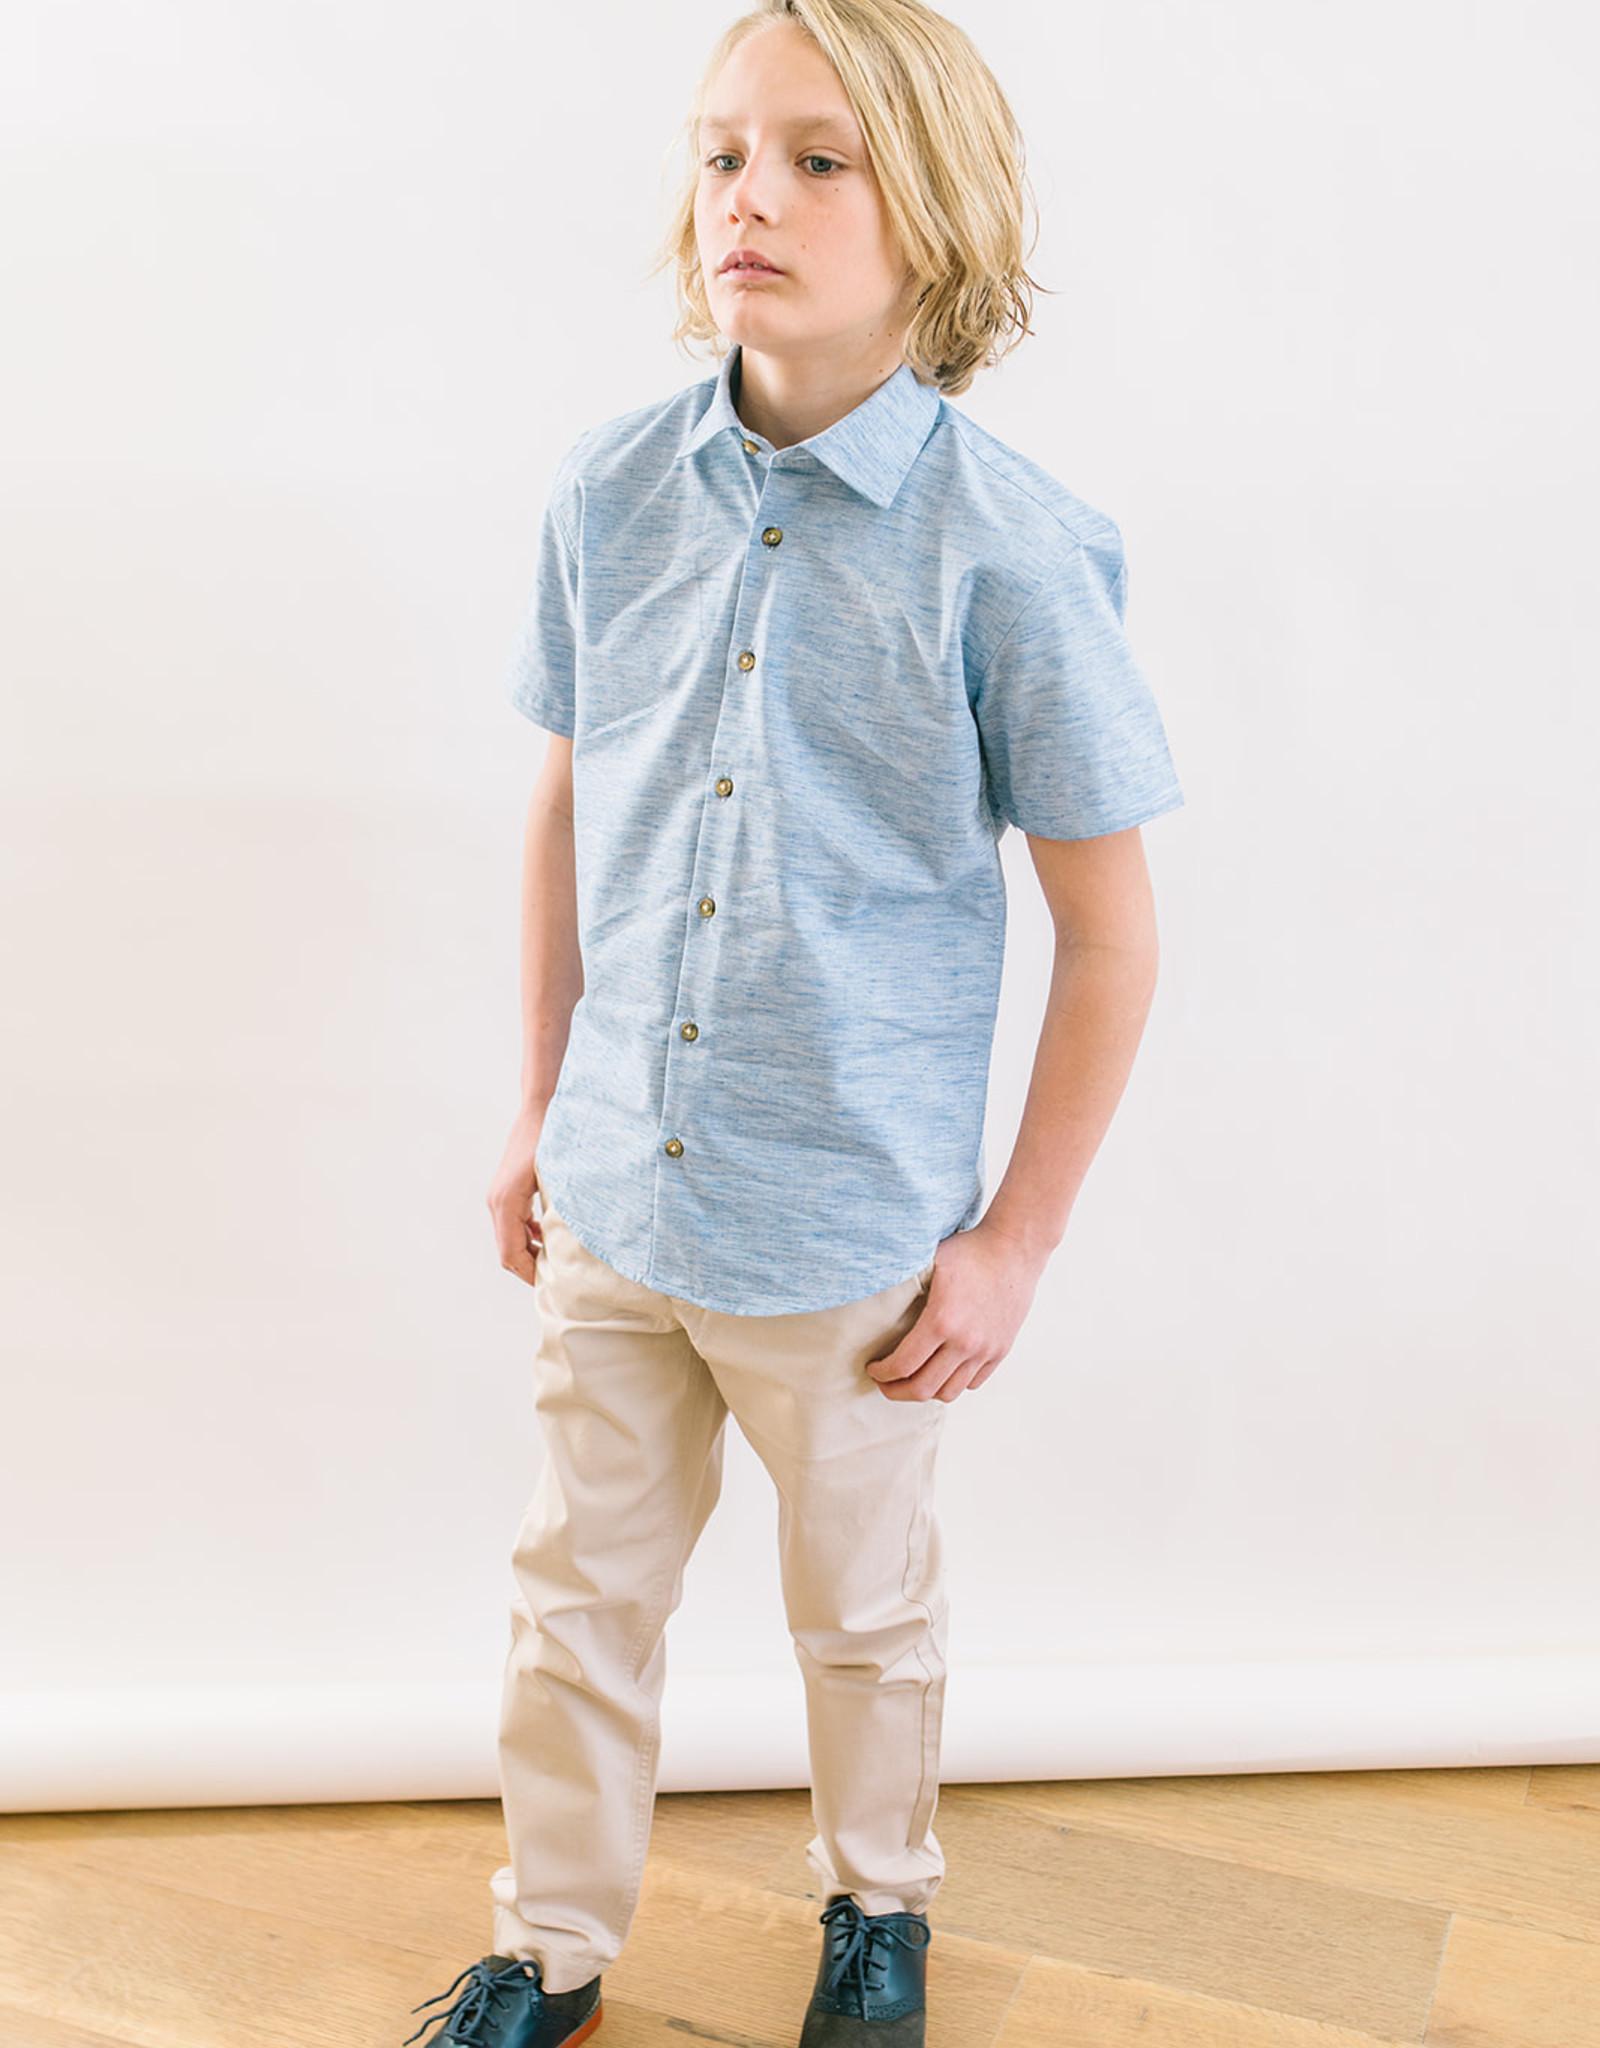 Leo and Zachary Shirt  Variegated Chambray Short Sleeves